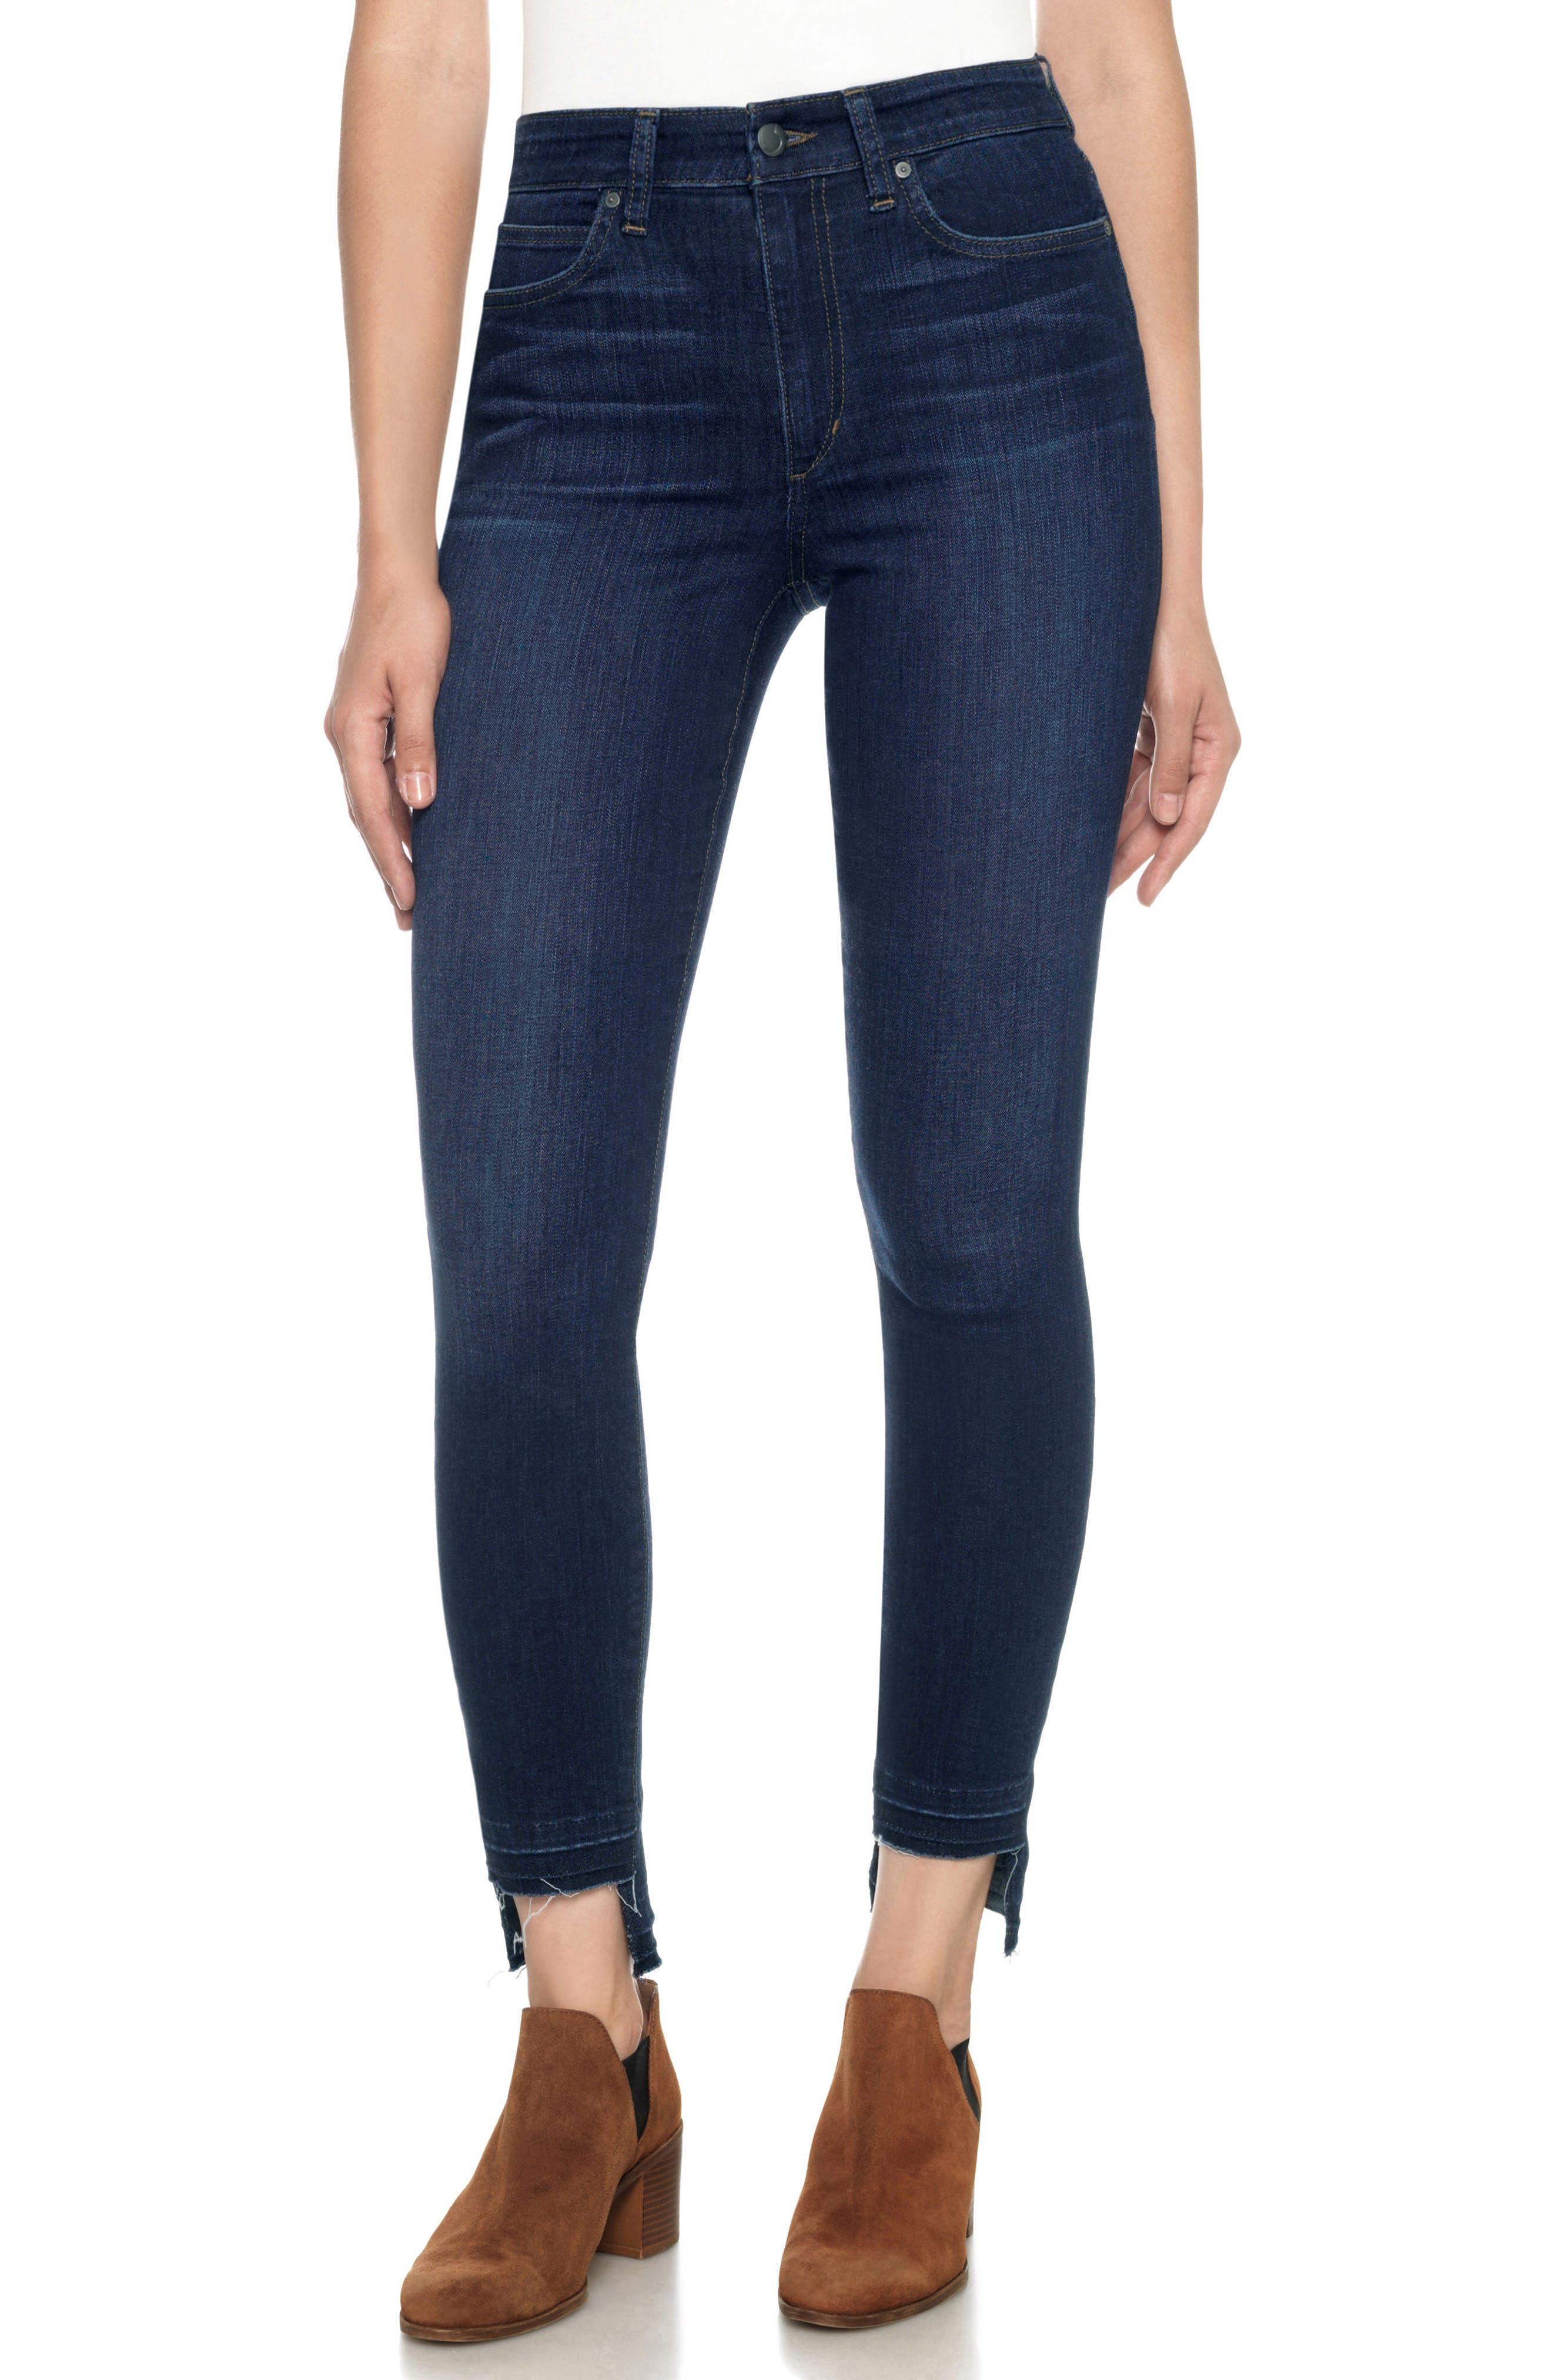 Main Image - Joe's Flawless - Charlie High Waist Step Hem Ankle Skinny Jeans (Nurie)